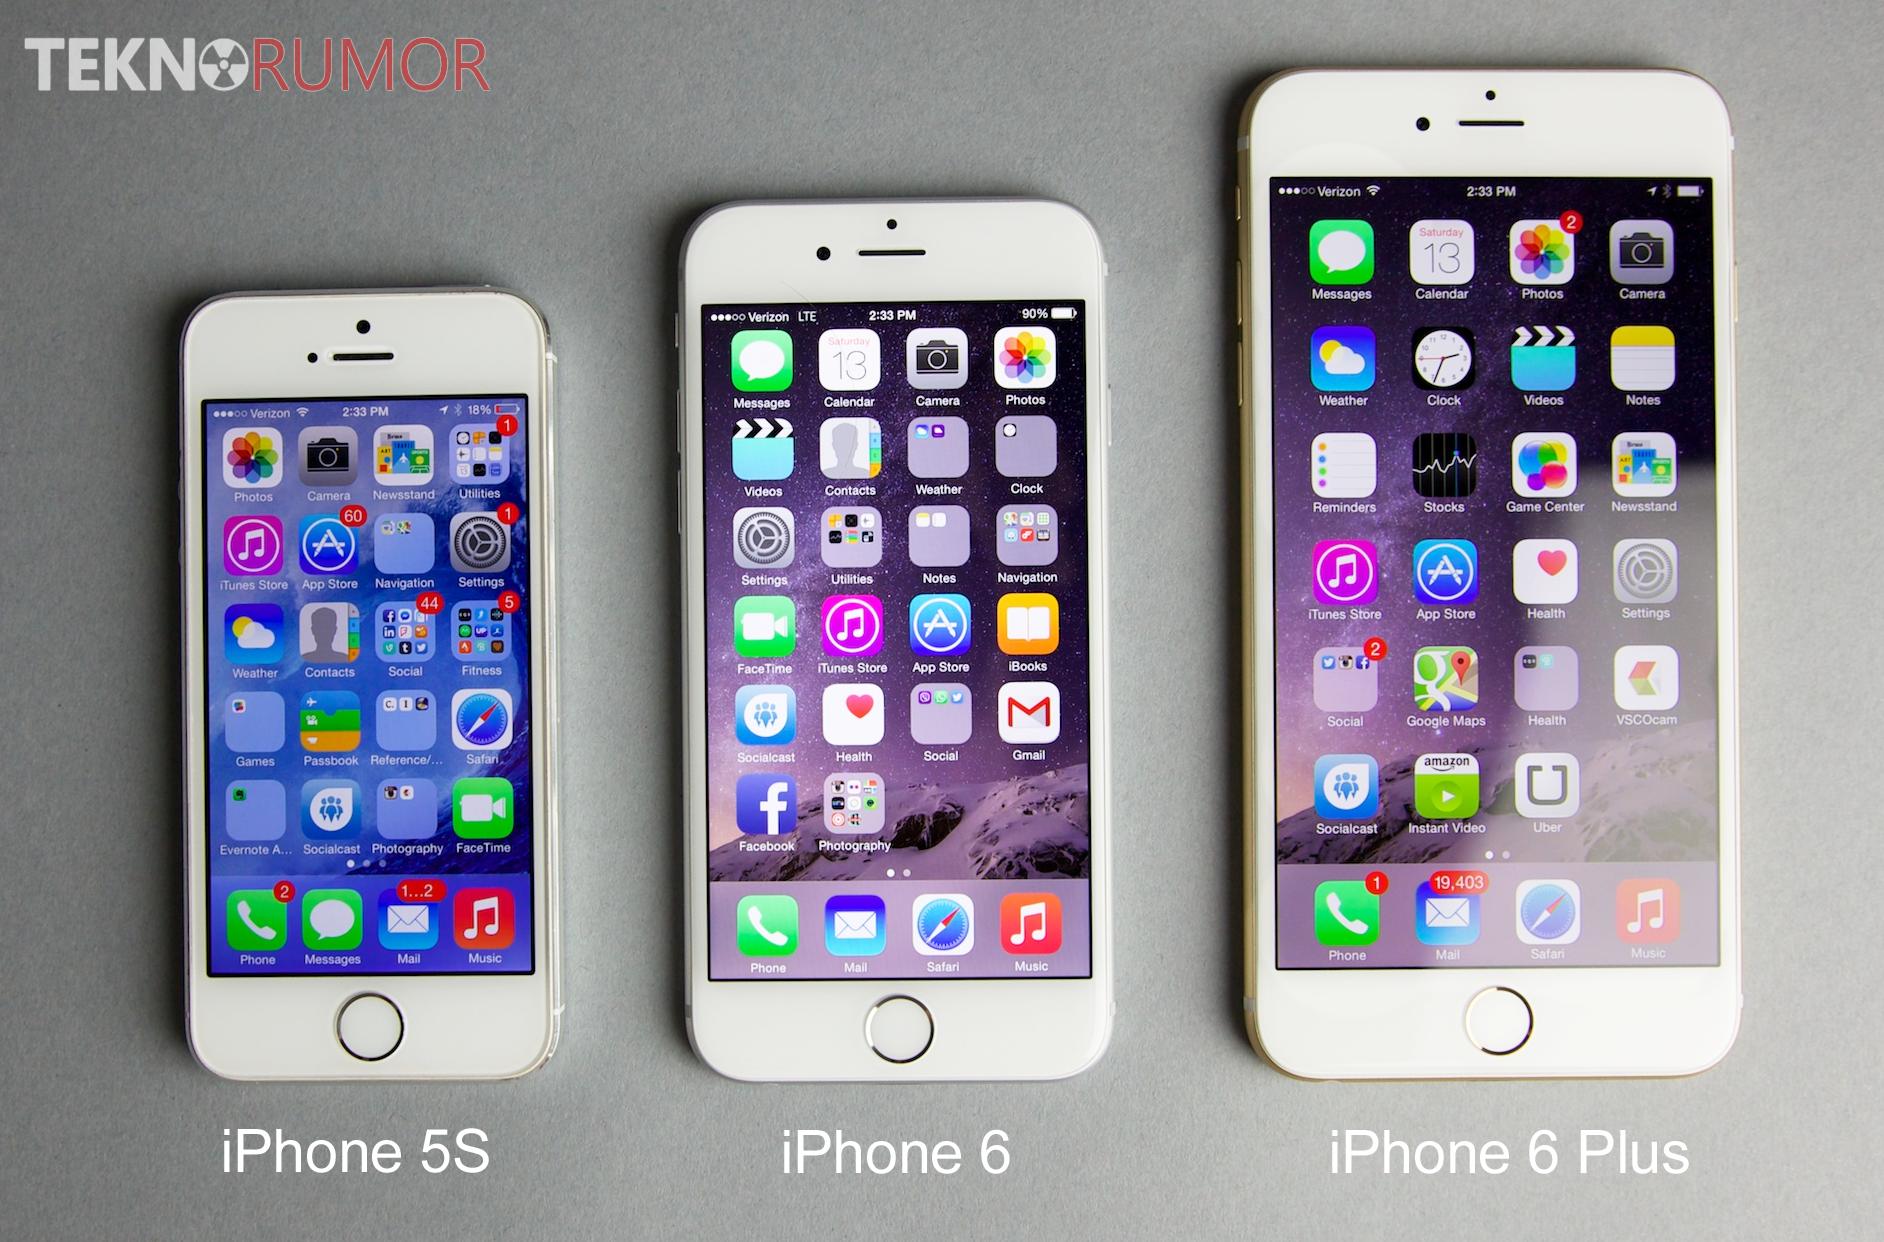 Harga dan spesifikasi apple iphone 6 iphone 6 plus terbaru harga dan spesifikasi apple iphone 6 iphone 6 plus terbaru reheart Choice Image